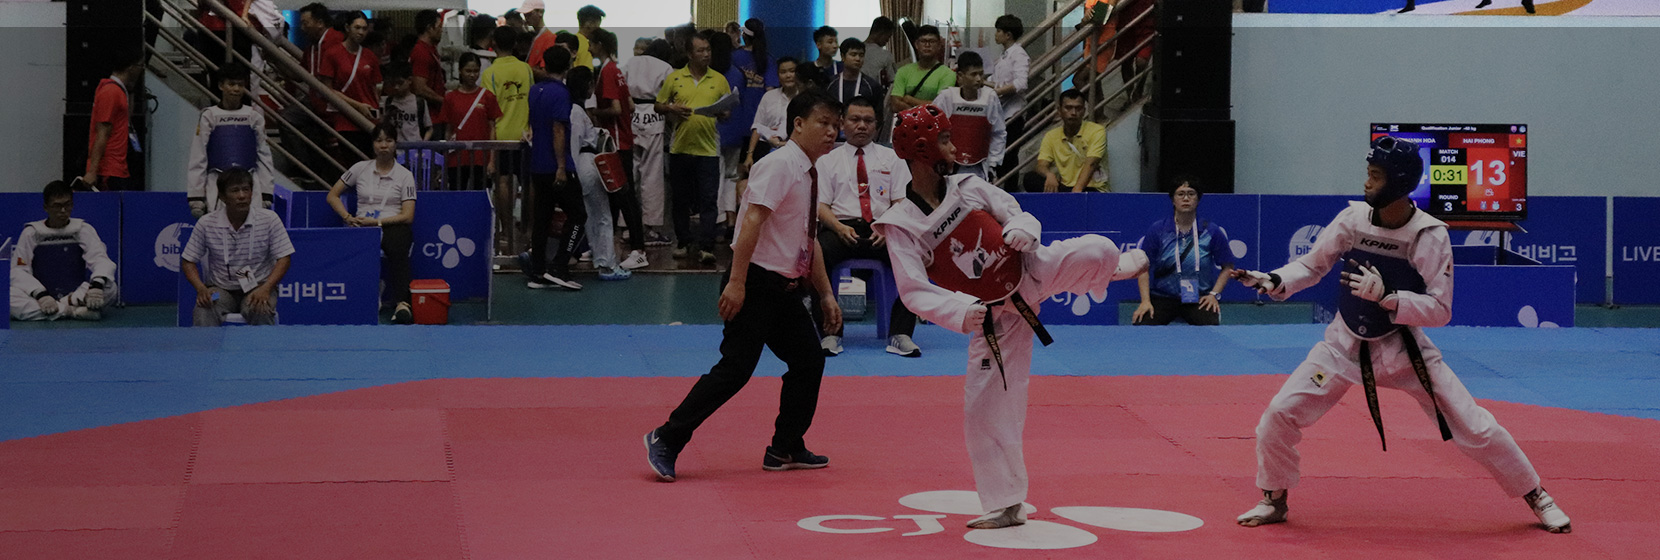 Tennis, Taekwondo